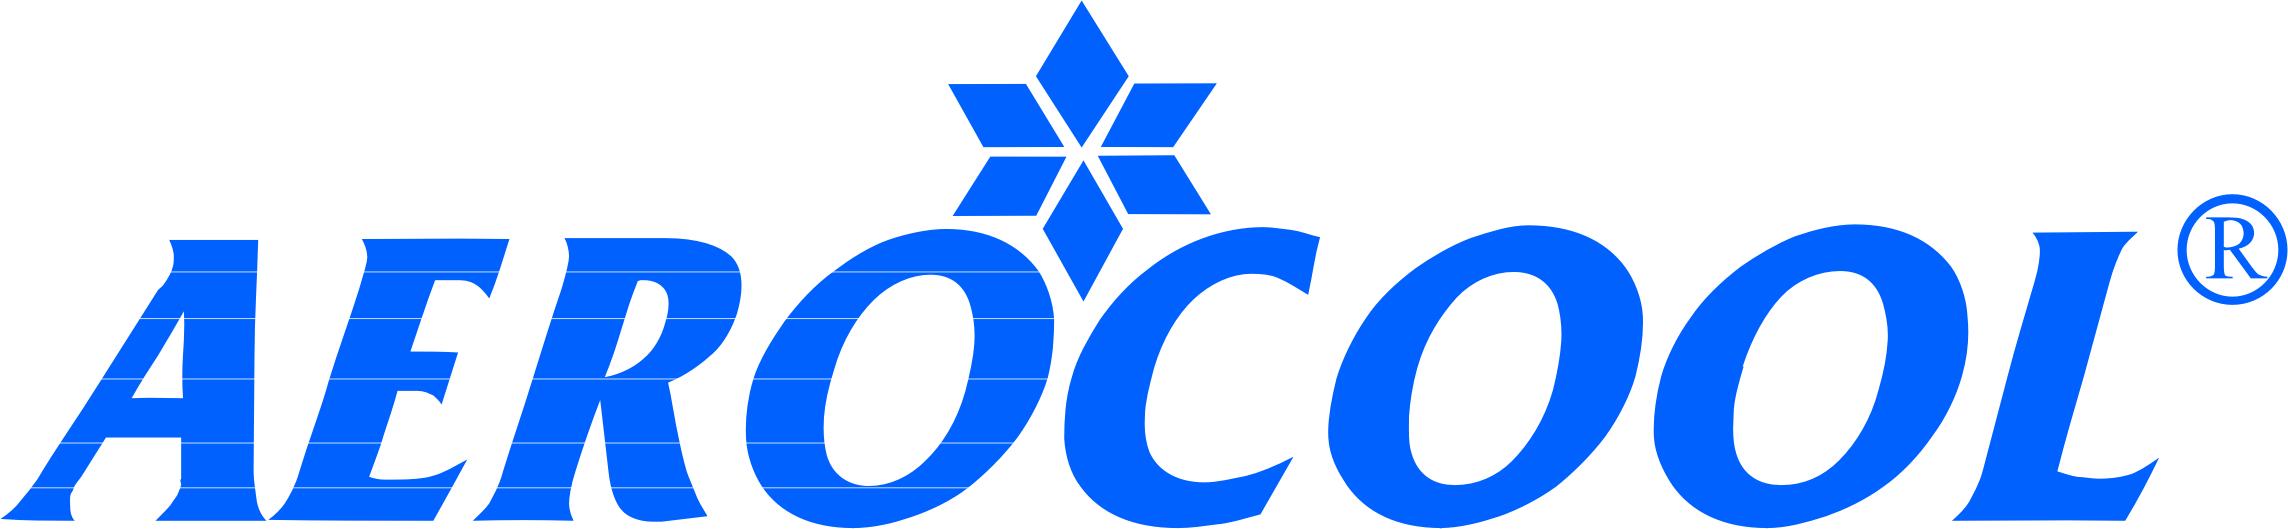 aerocool-logo-.jpg